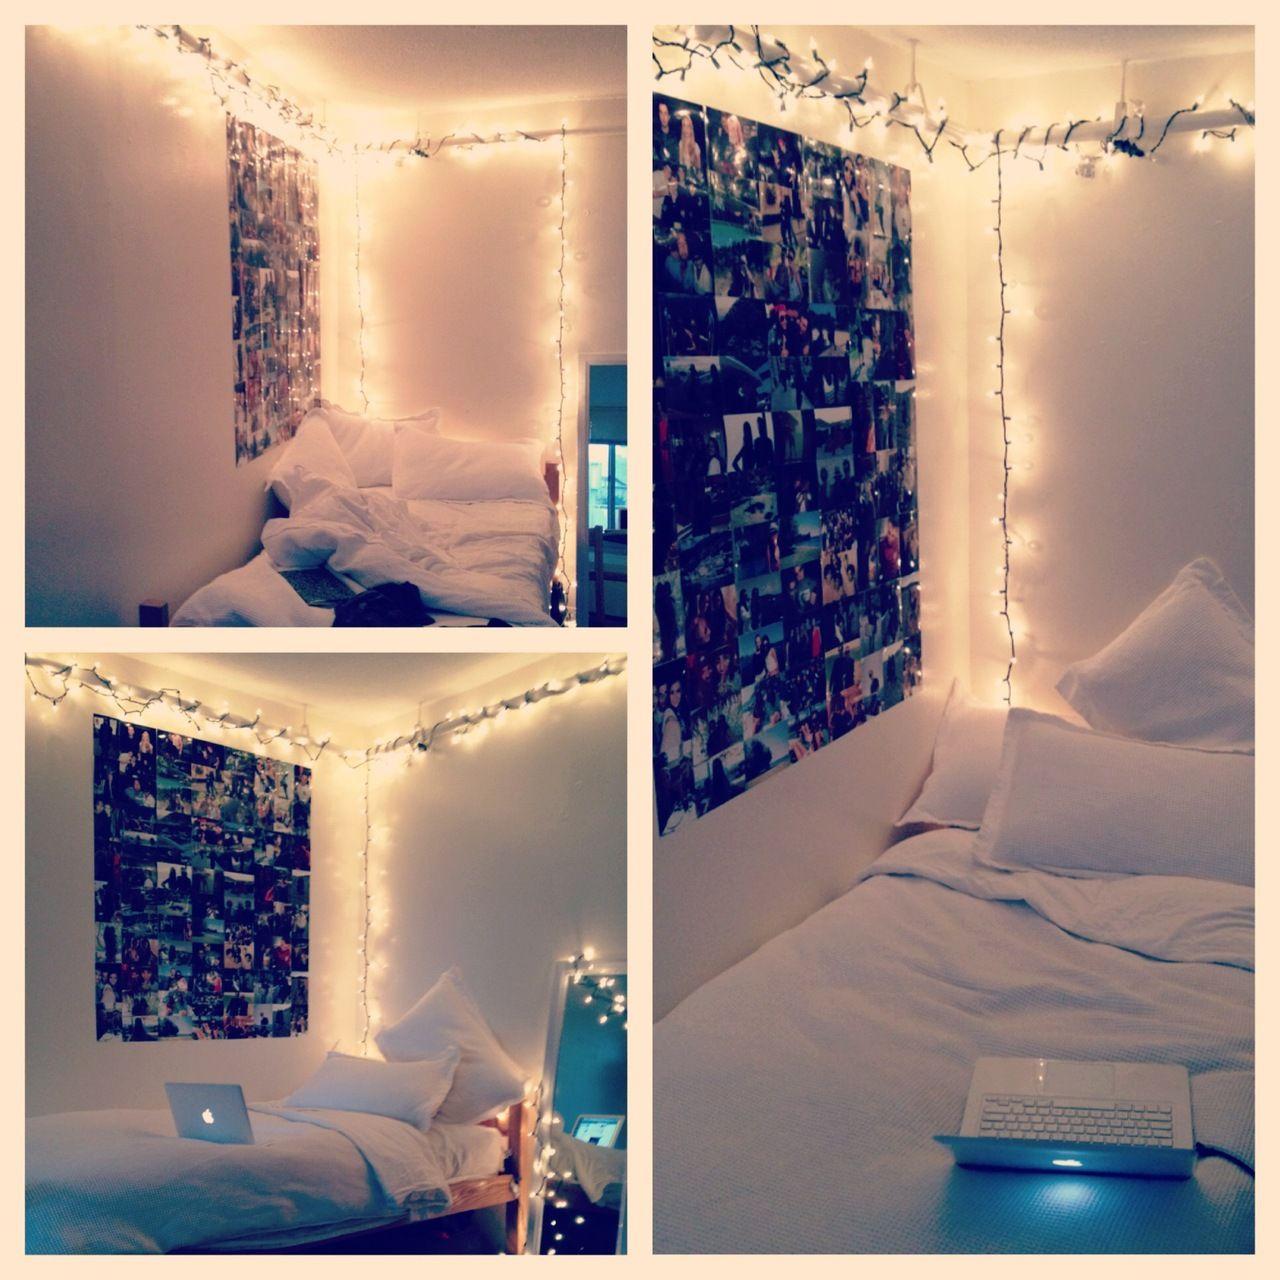 Dorm decor lights - Lights And Dorm Decor